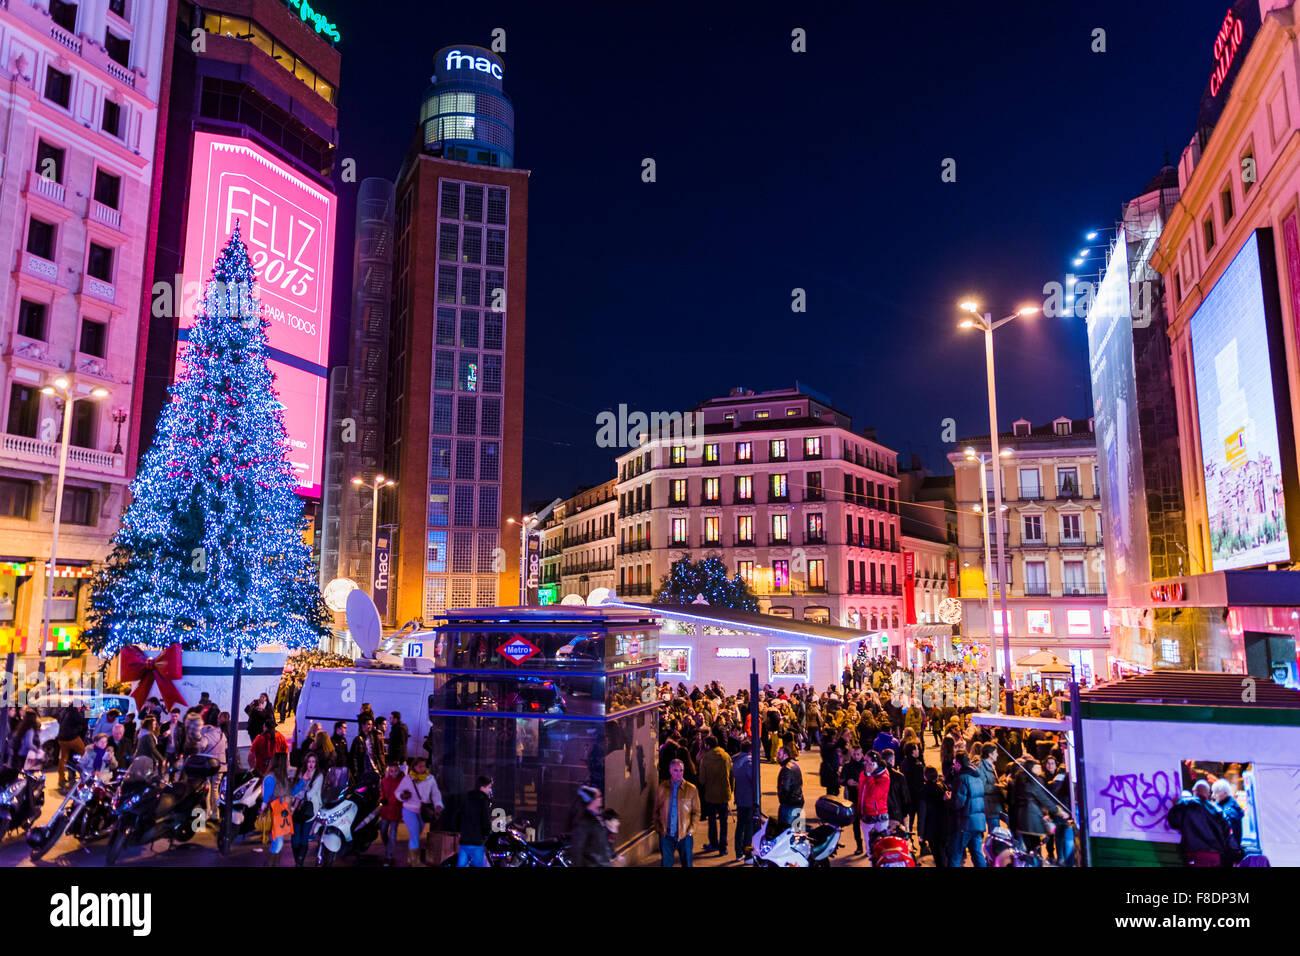 Weihnachtsbeleuchtung in Madrid. Spanien. Europa Stockbild